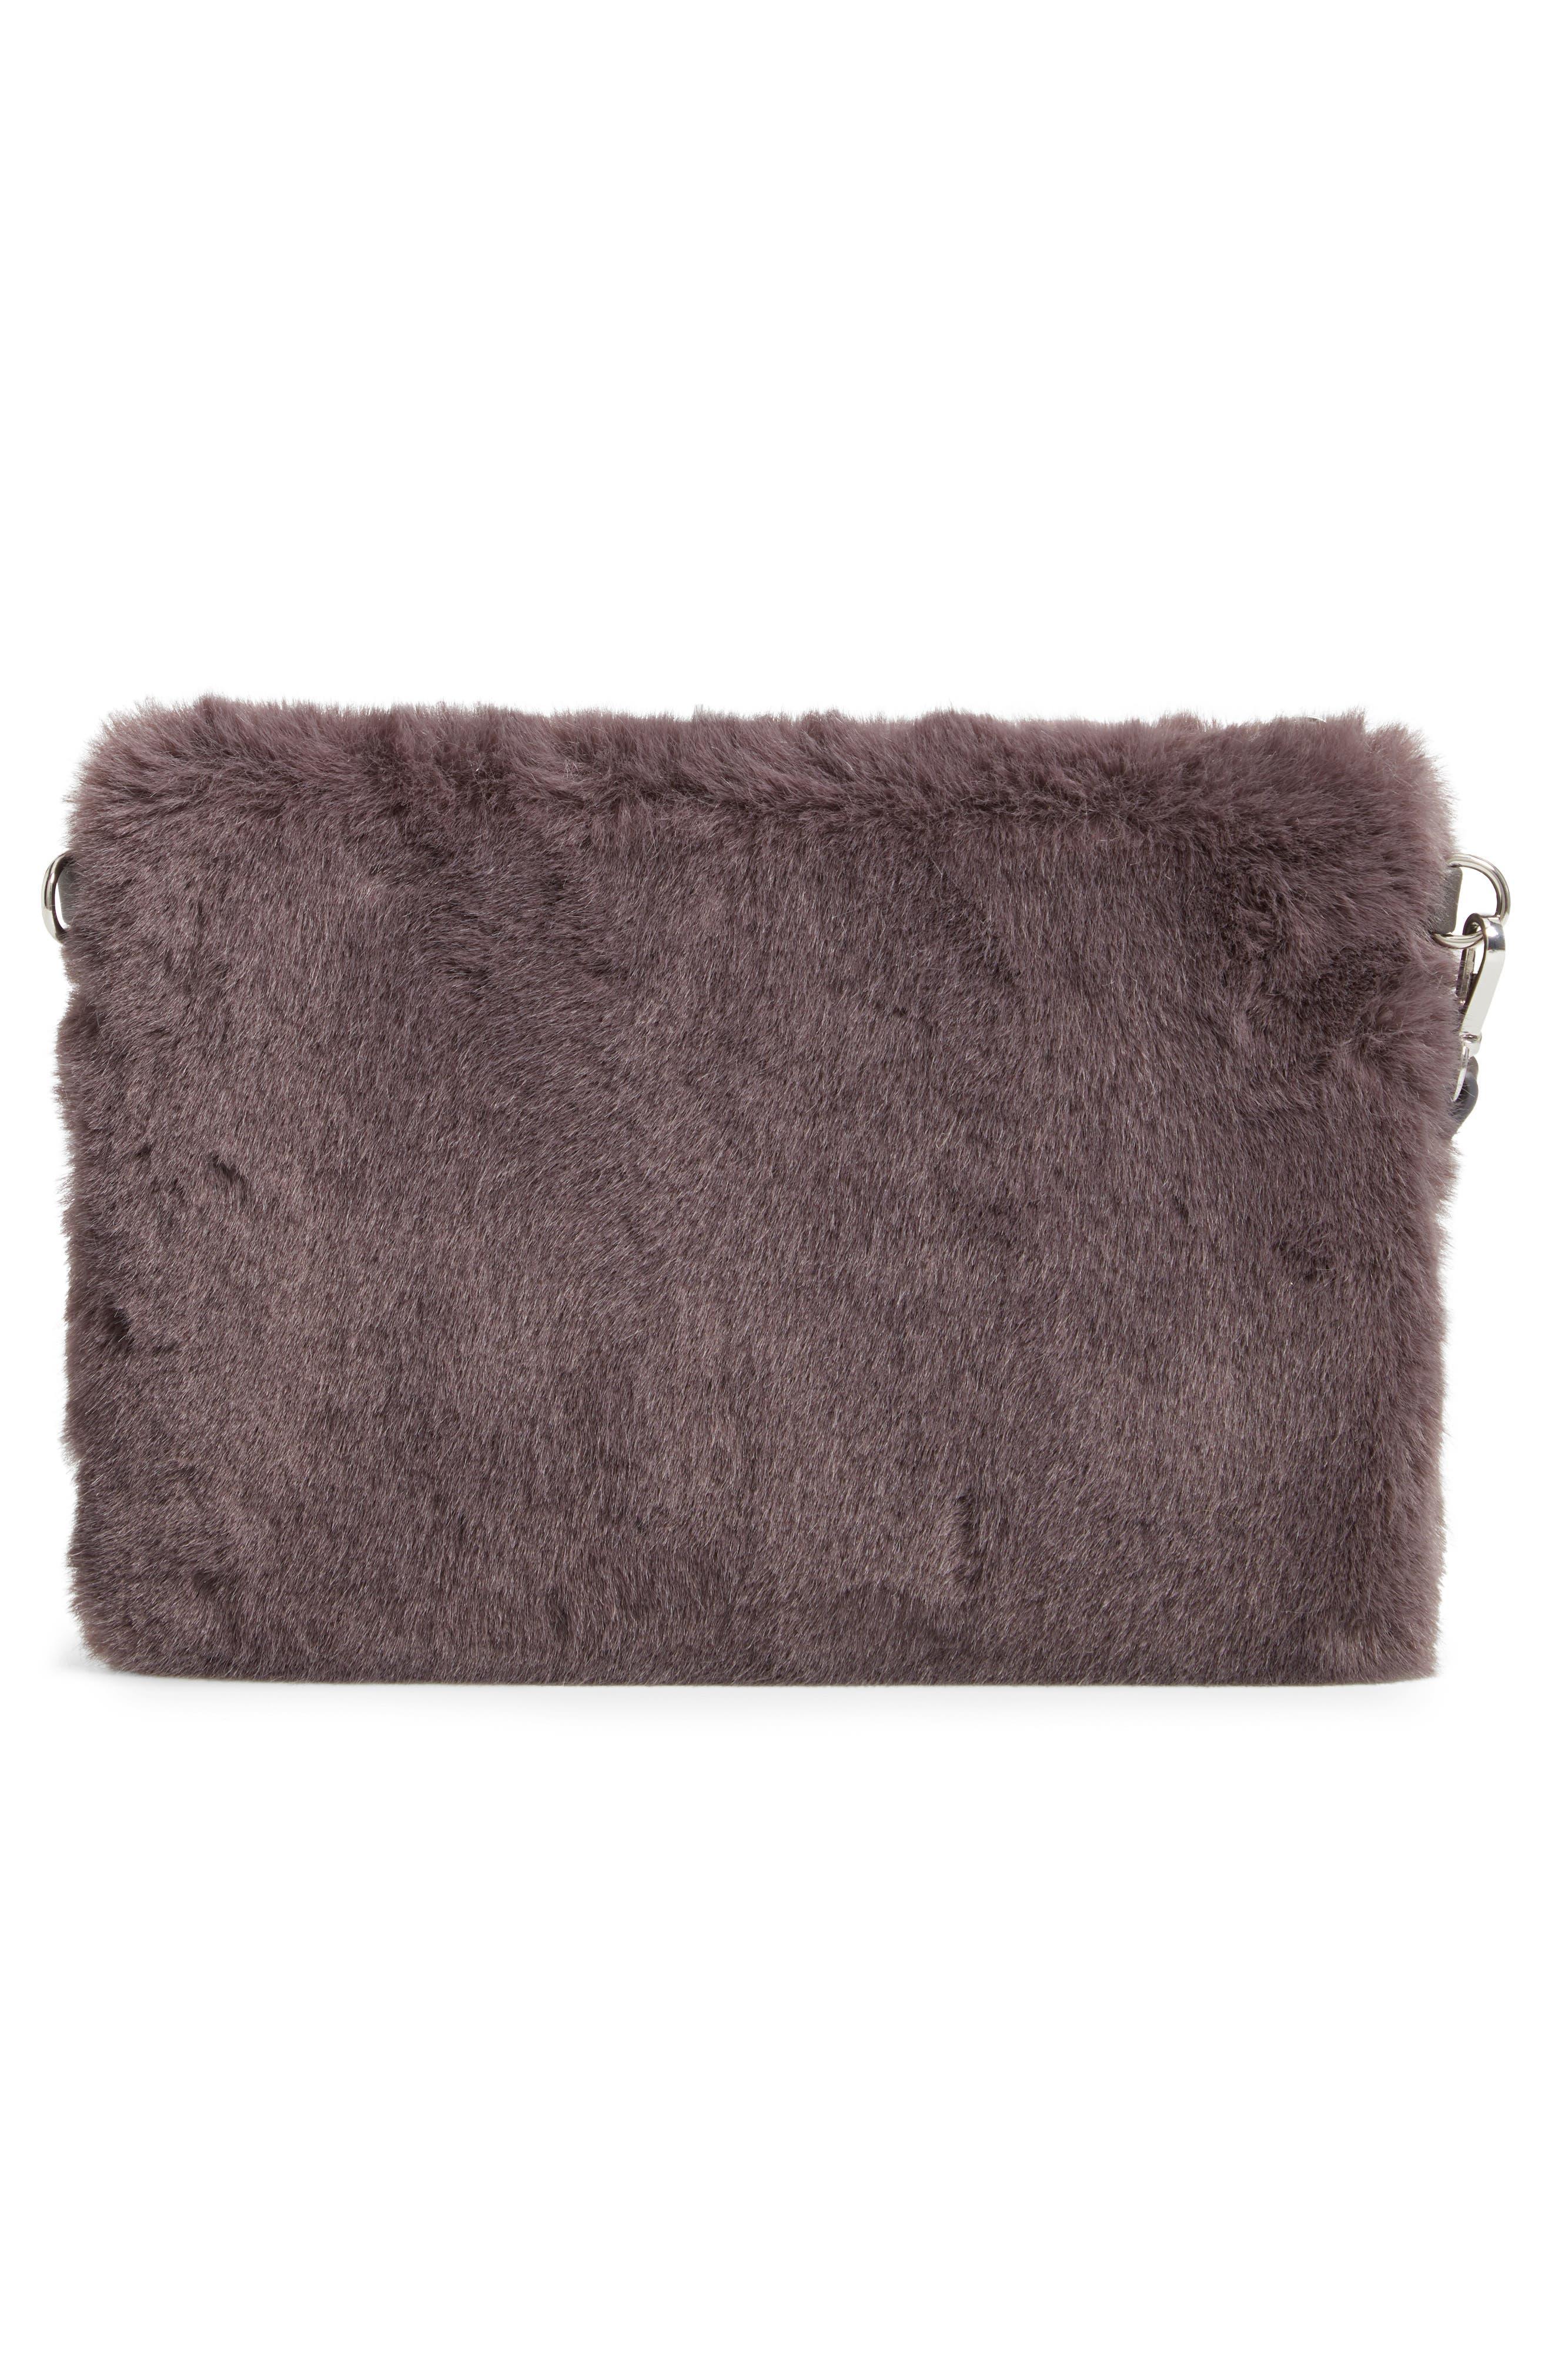 Astley Faux Fur Convertible Clutch,                             Alternate thumbnail 4, color,                             GREY CASTLEROCK